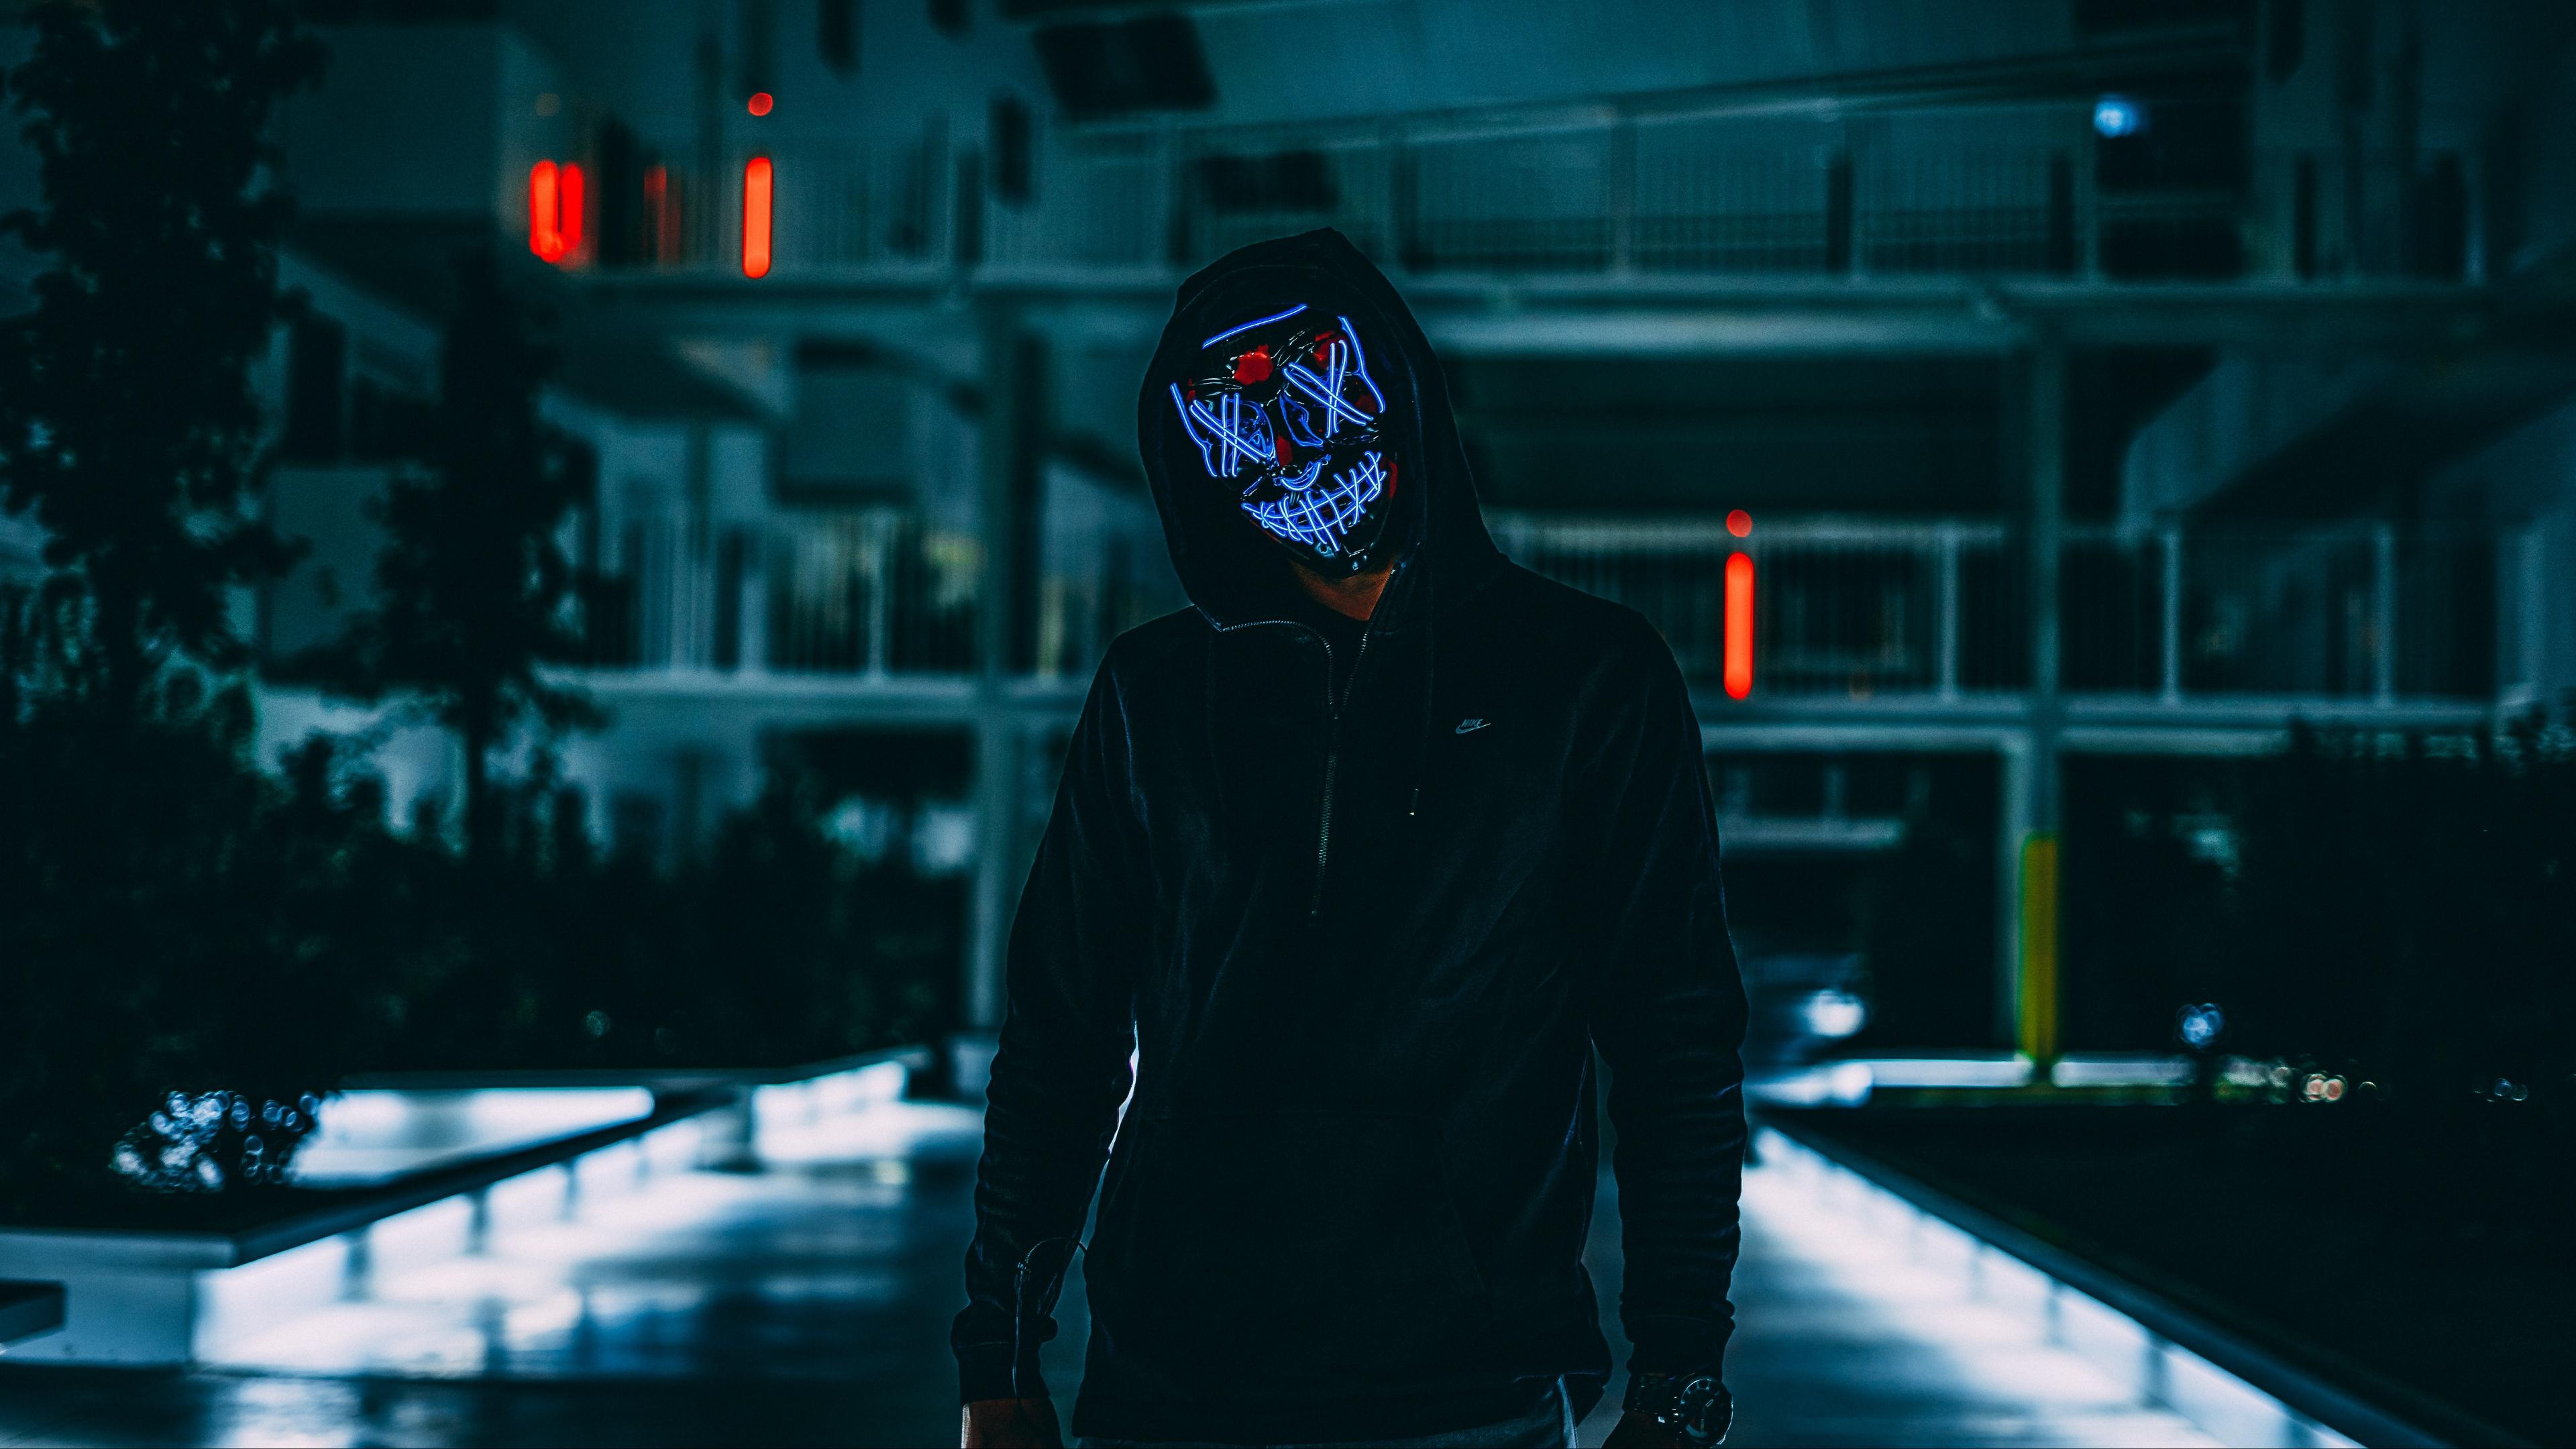 18+ Neon Mask Wallpapers on WallpaperSafari